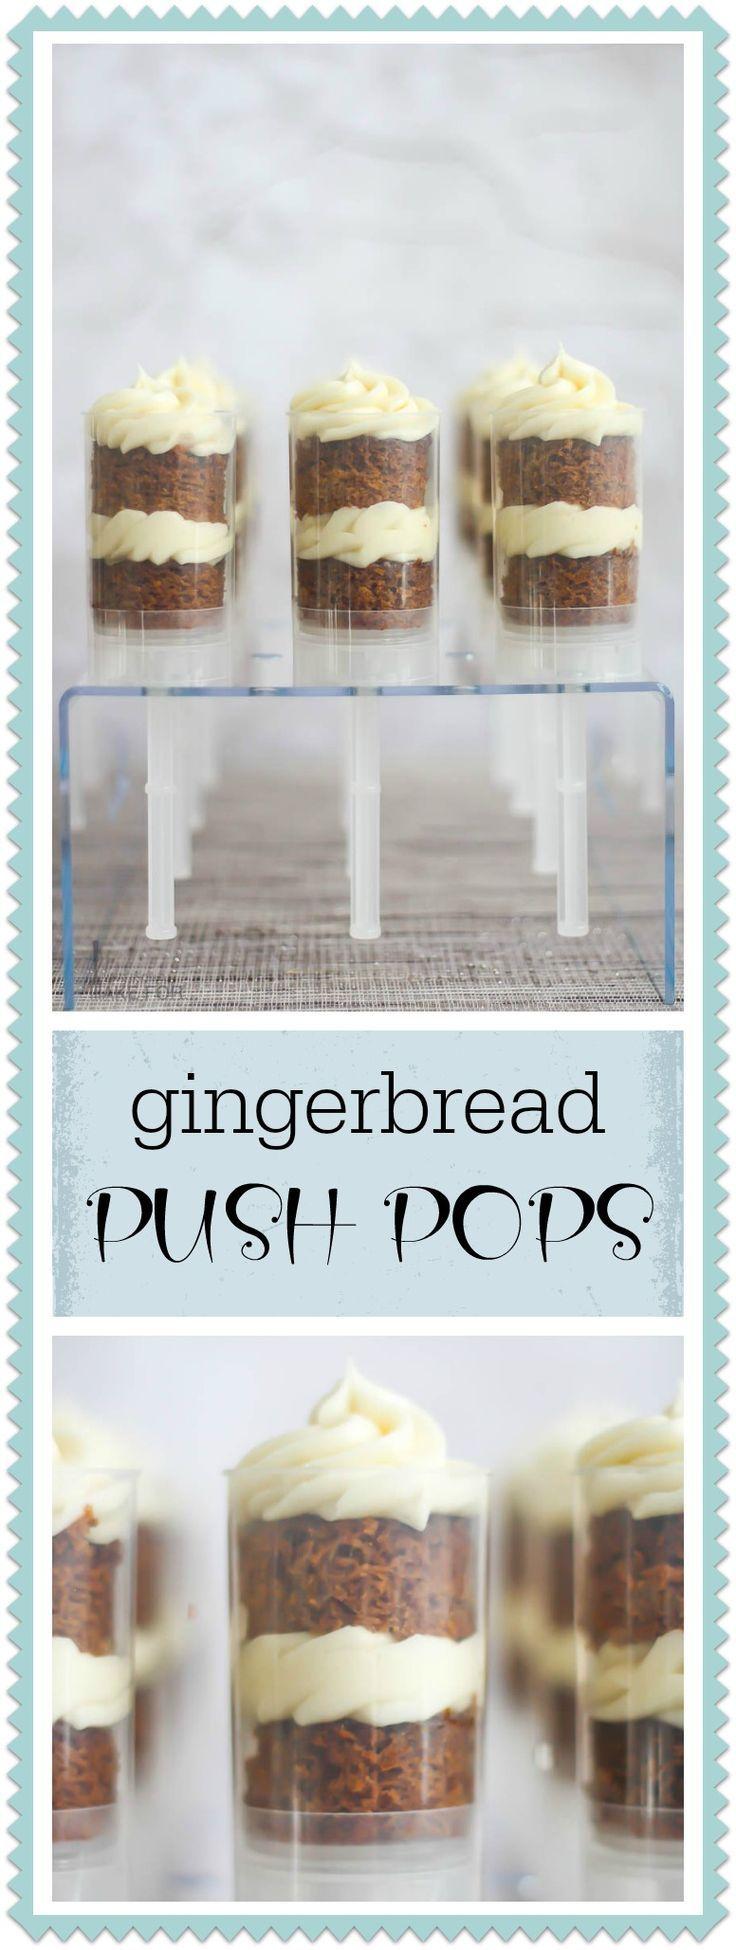 Gingerbread Push Pops